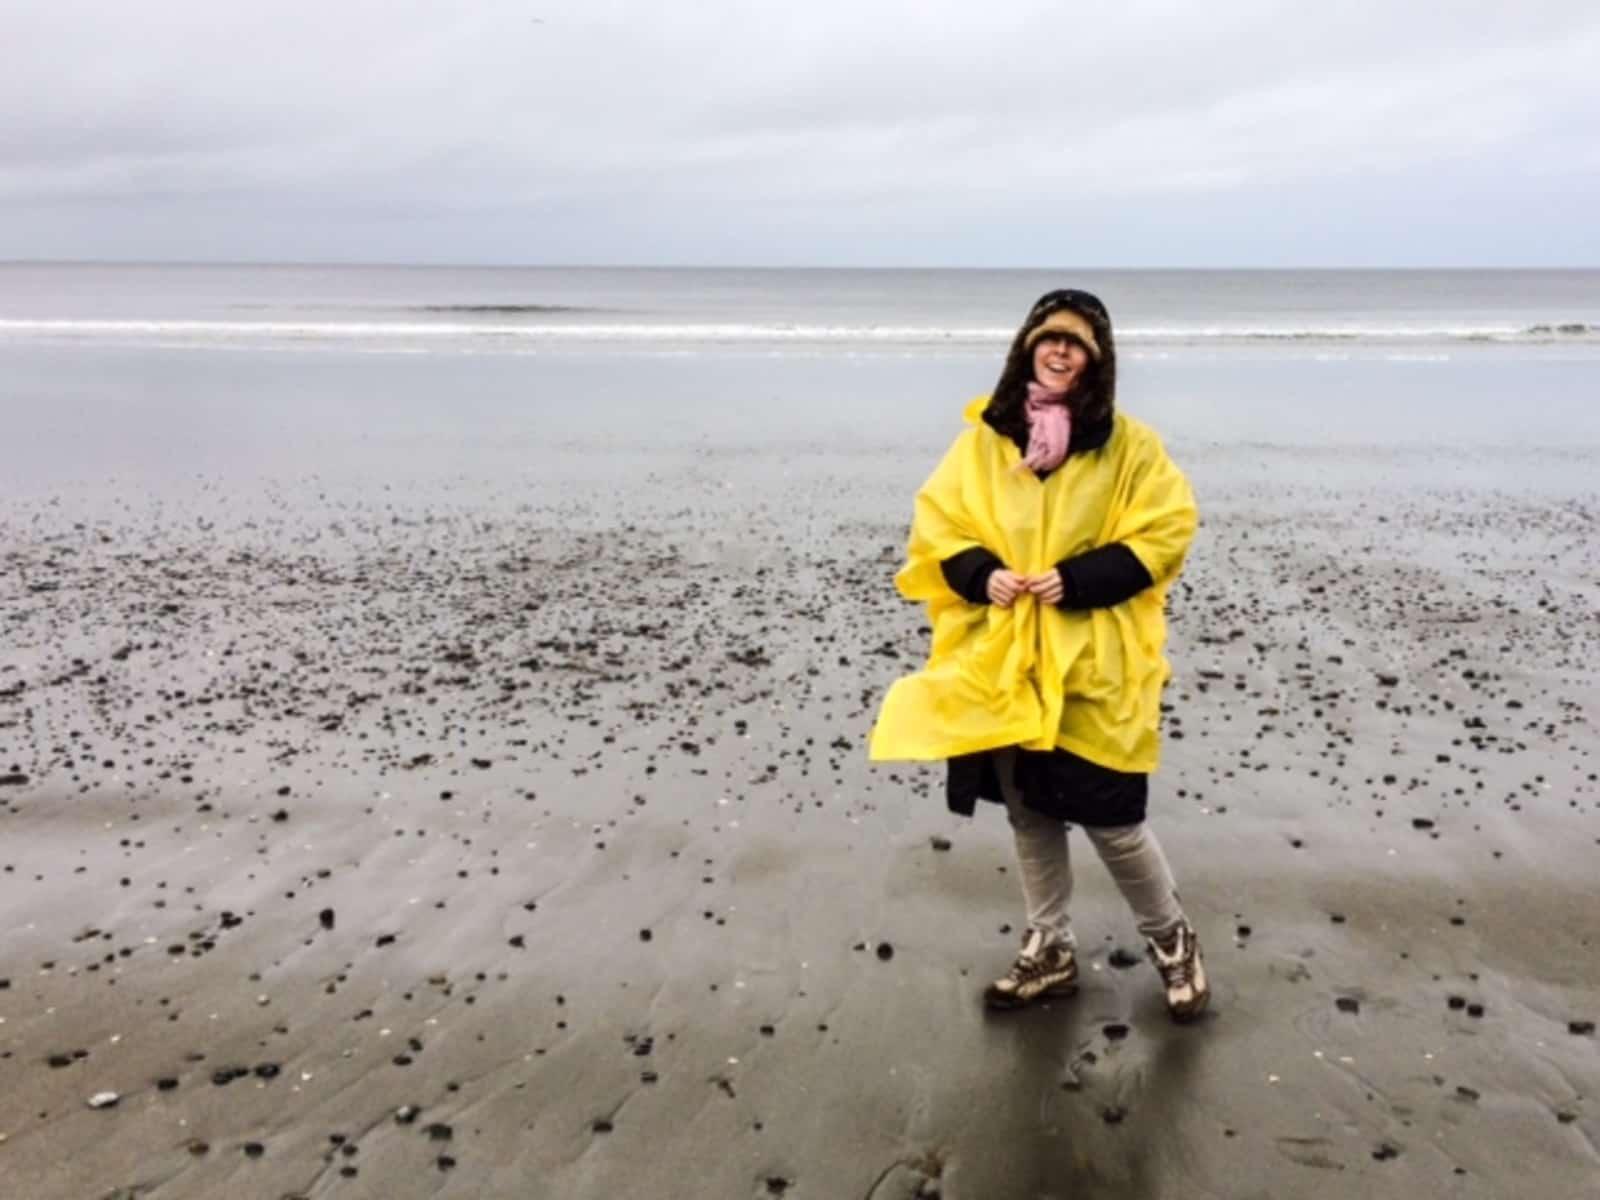 Jeannine from Dartmouth, Nova Scotia, Canada